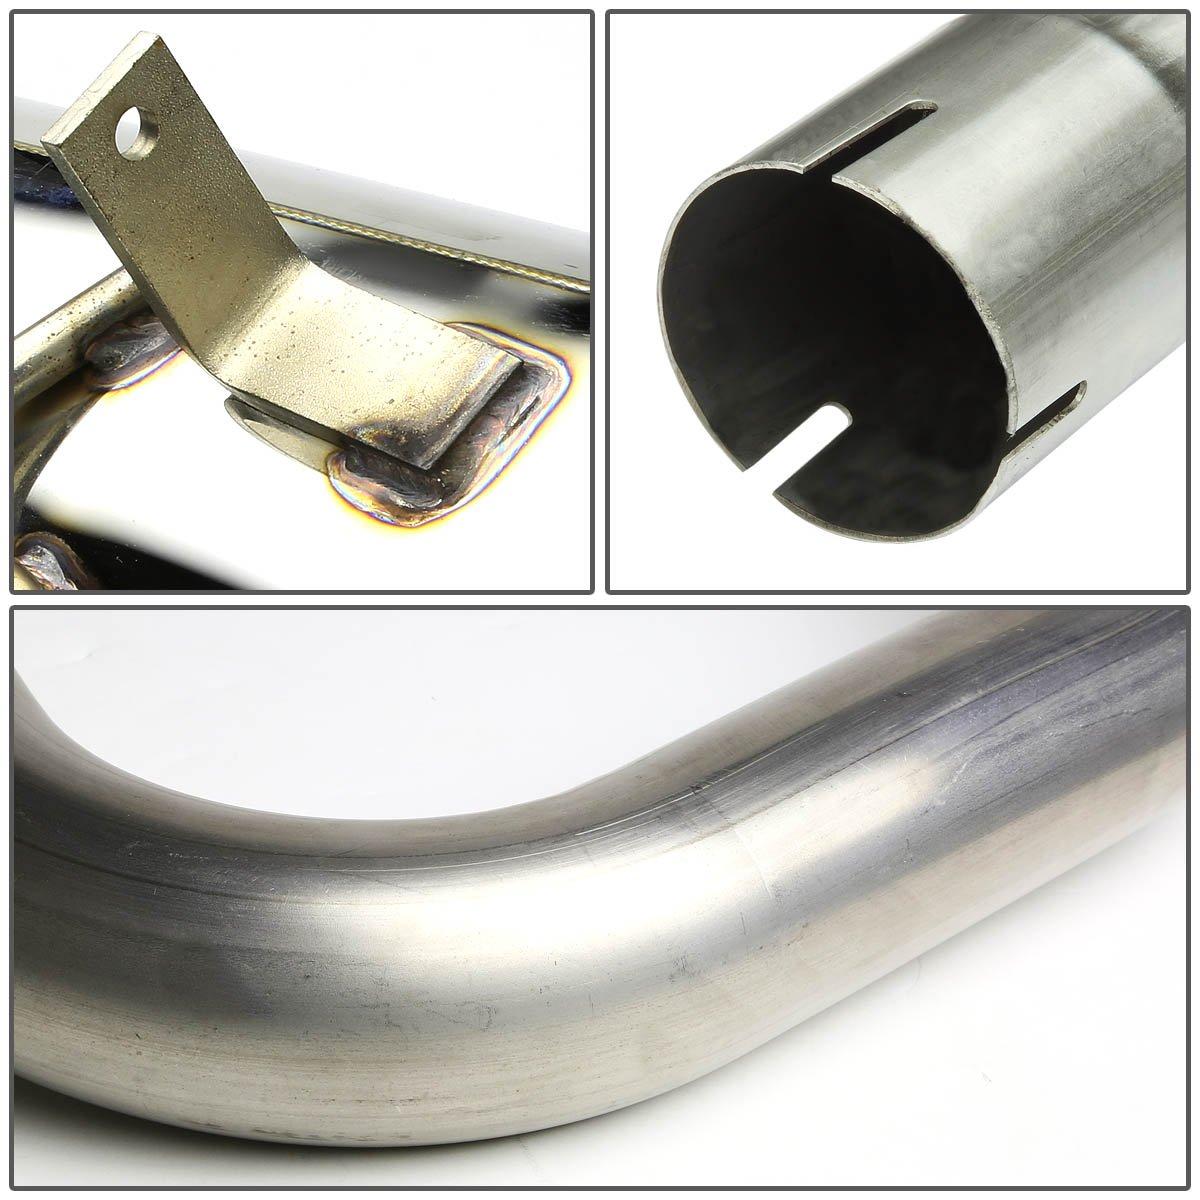 DNA MOTORING CBE-CPTC99-NRT Rolled CBECPTC99NRT Stainless Steel Catback Exhaust System